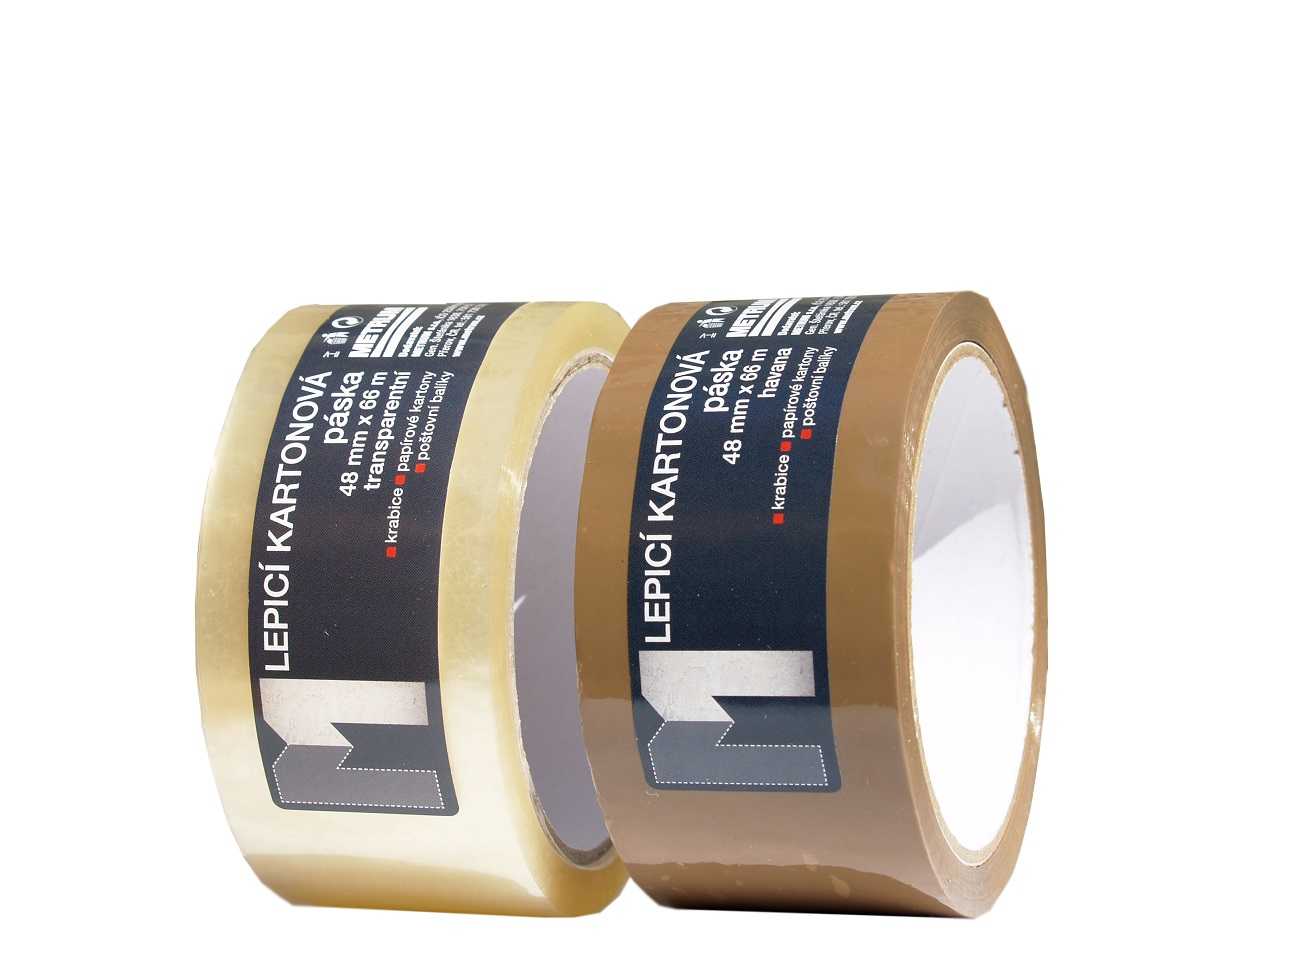 LOCKTAPE lepící páska kartonová 48mmx66m havana